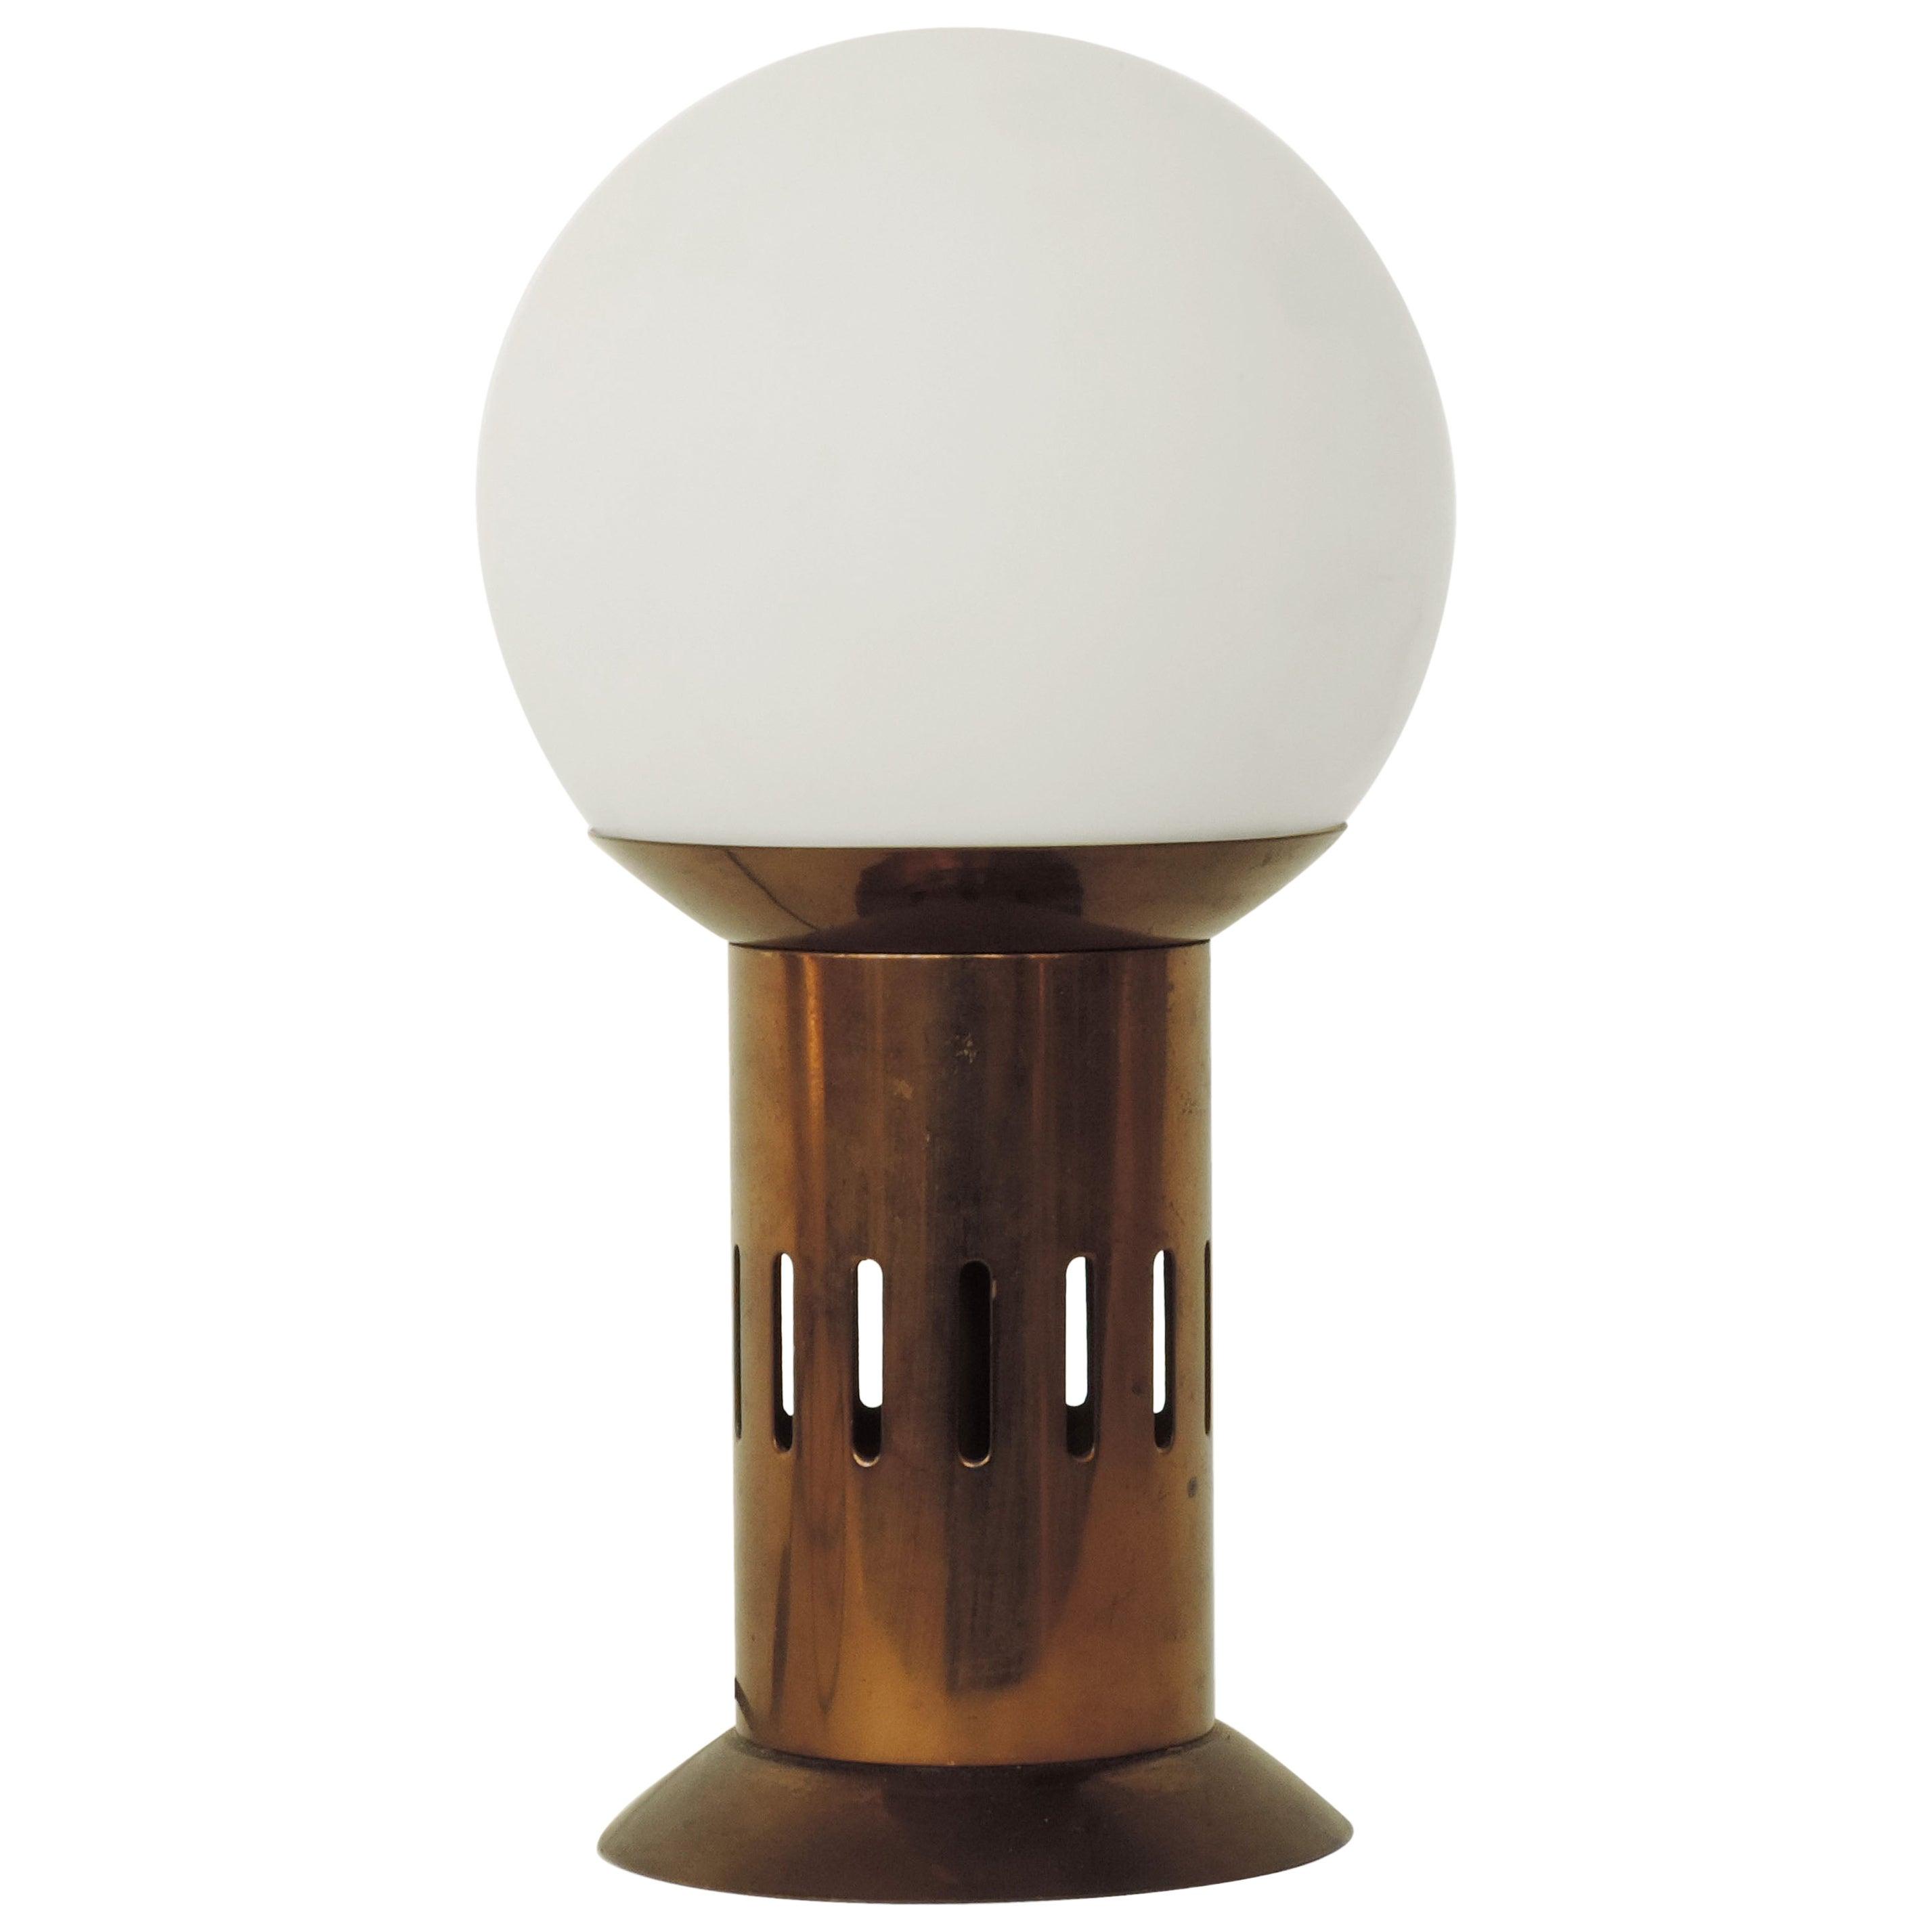 Sergio Asti and Sergio Favre Table Lamp for Adrasteia Milano, Italy 1960s